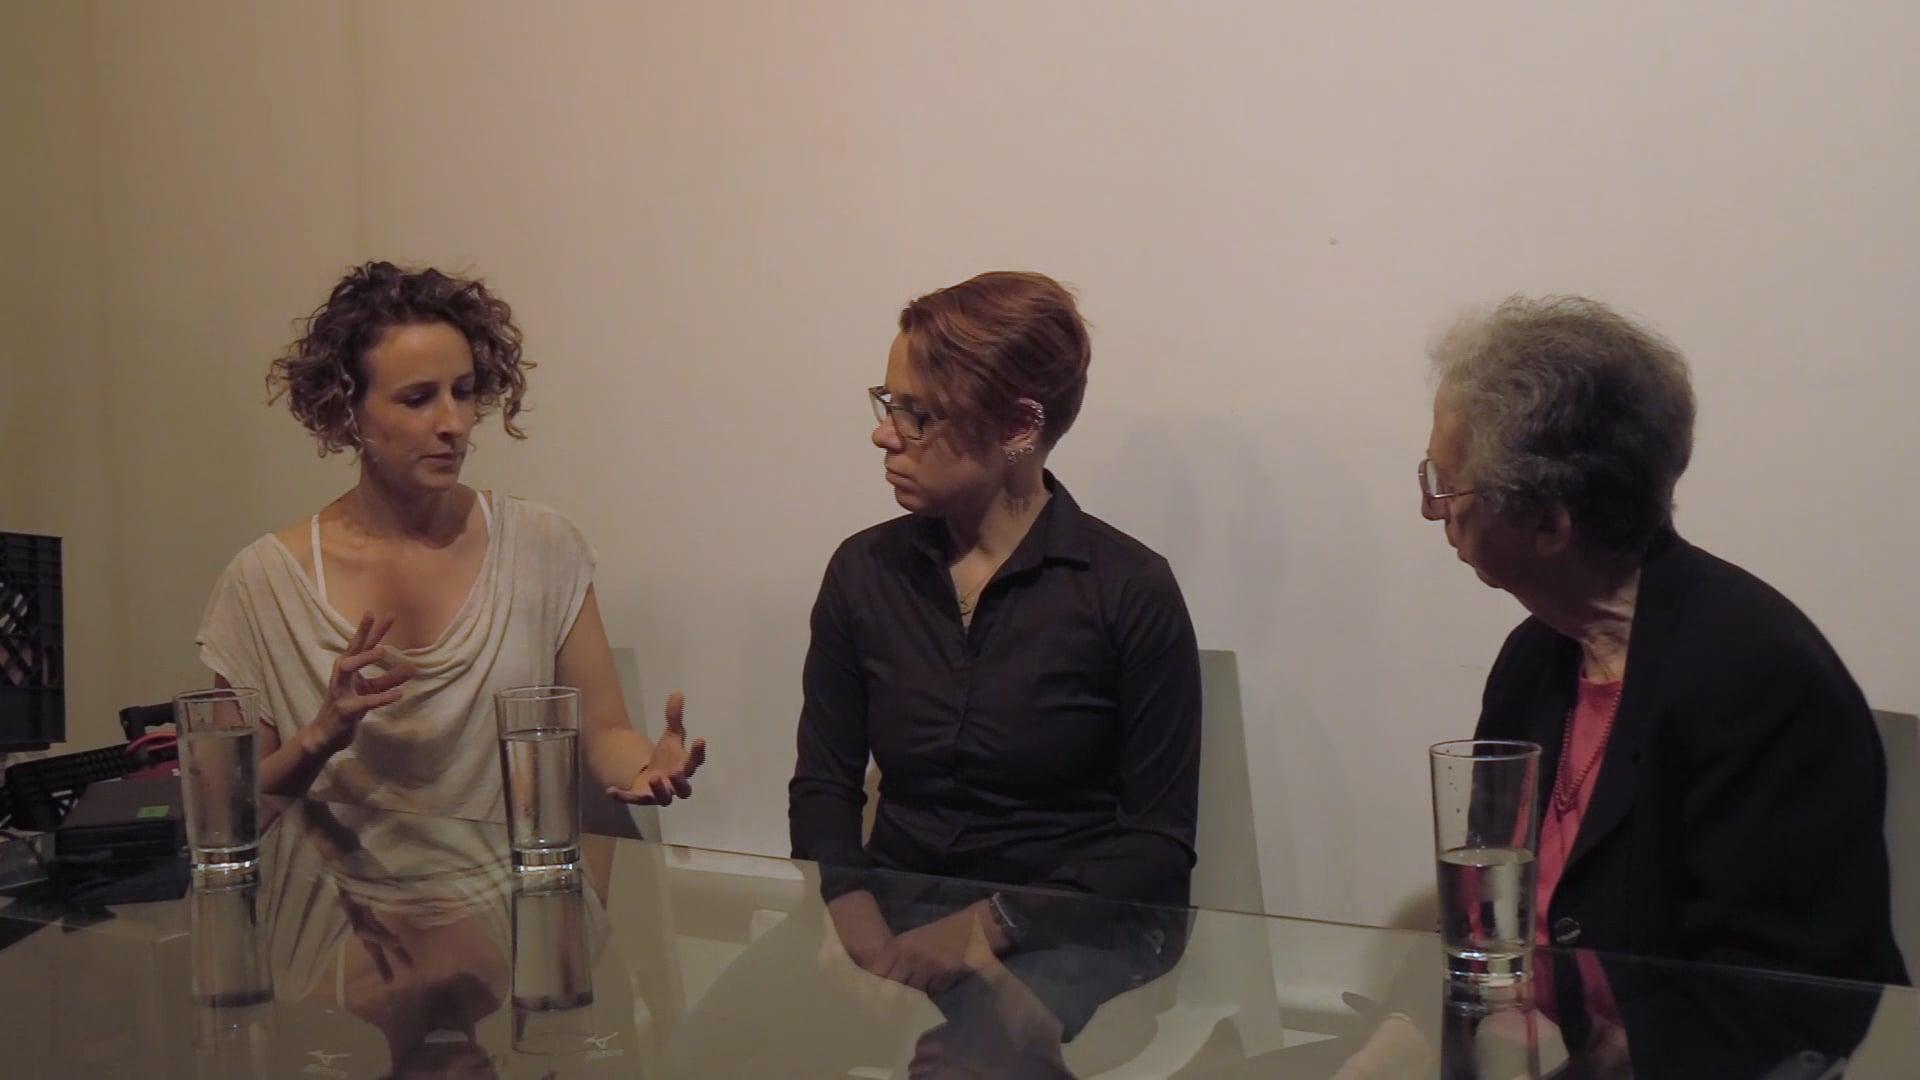 Interview with Paula Matthusen, Abigail Levine